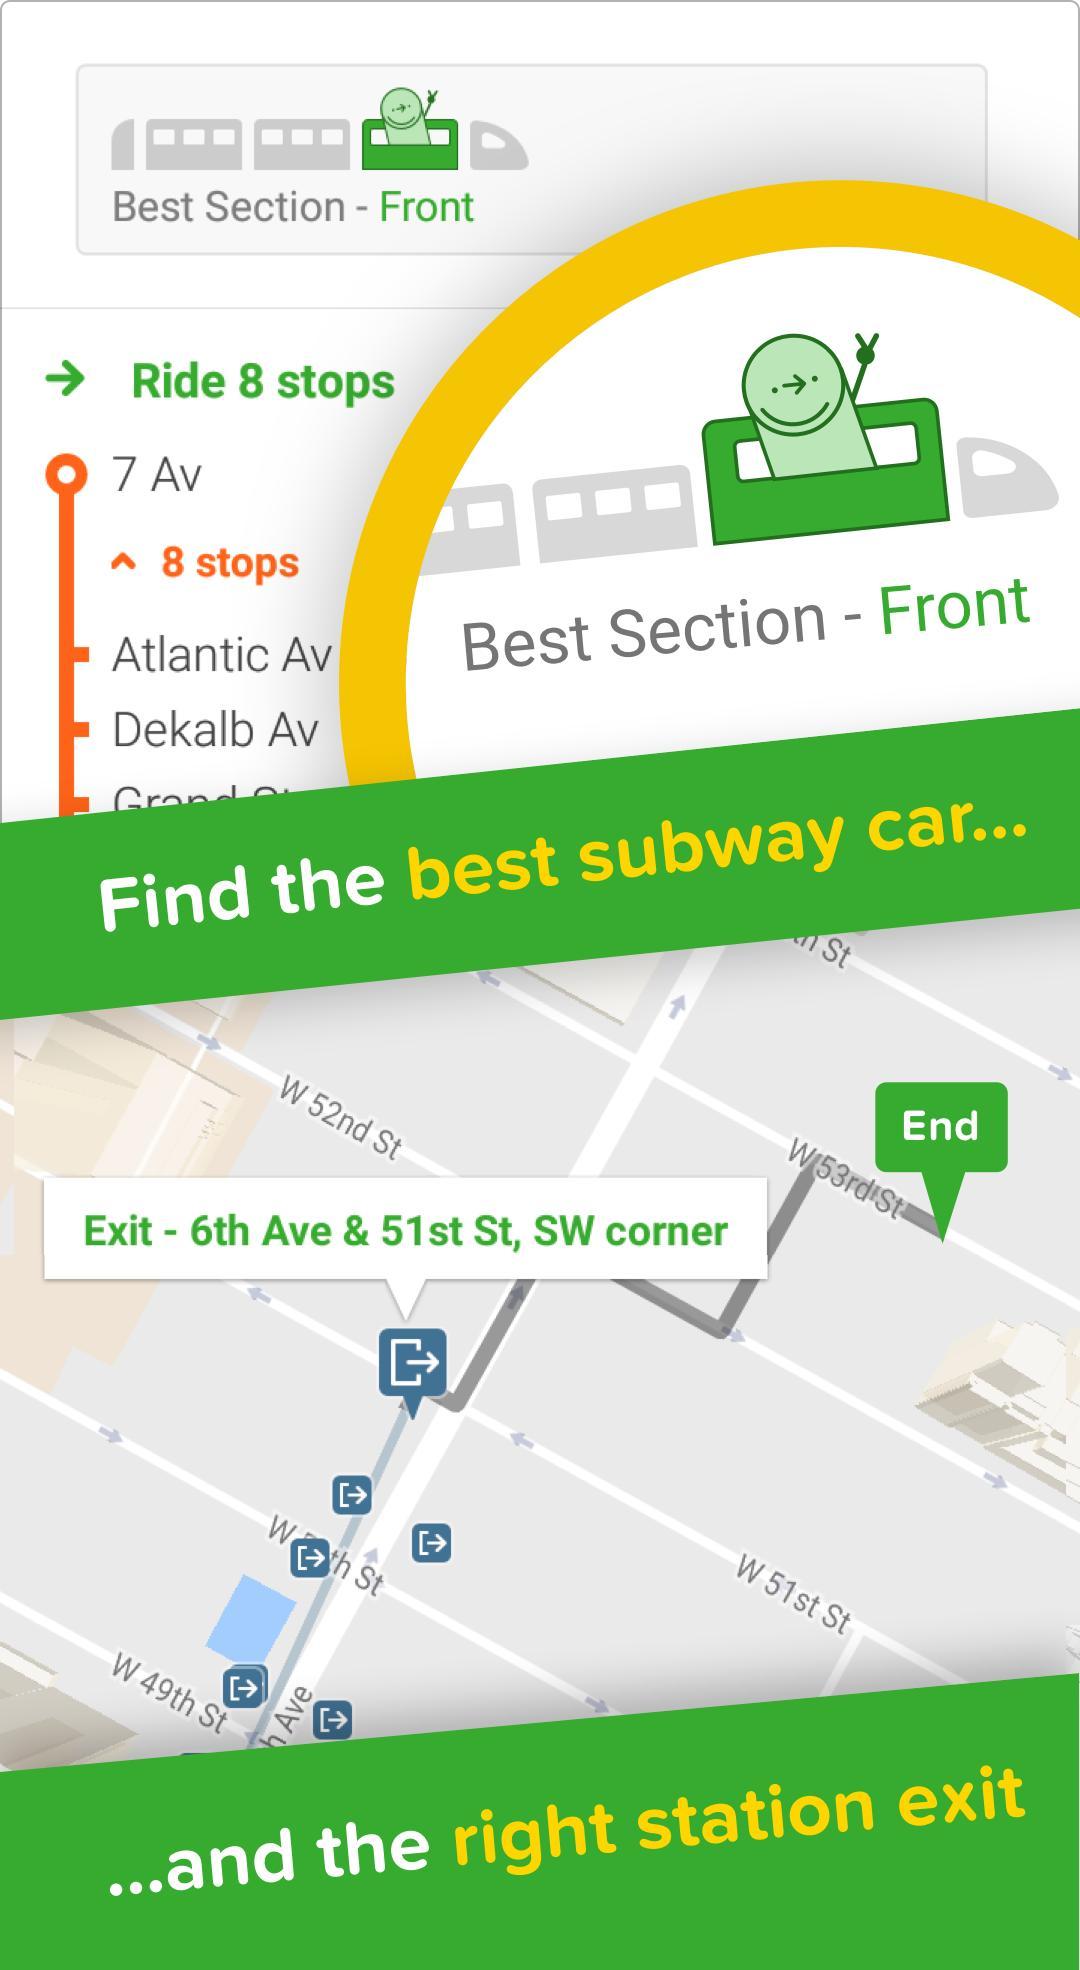 Citymapper the ultimate urban transit app 9.6.1 Screenshot 4